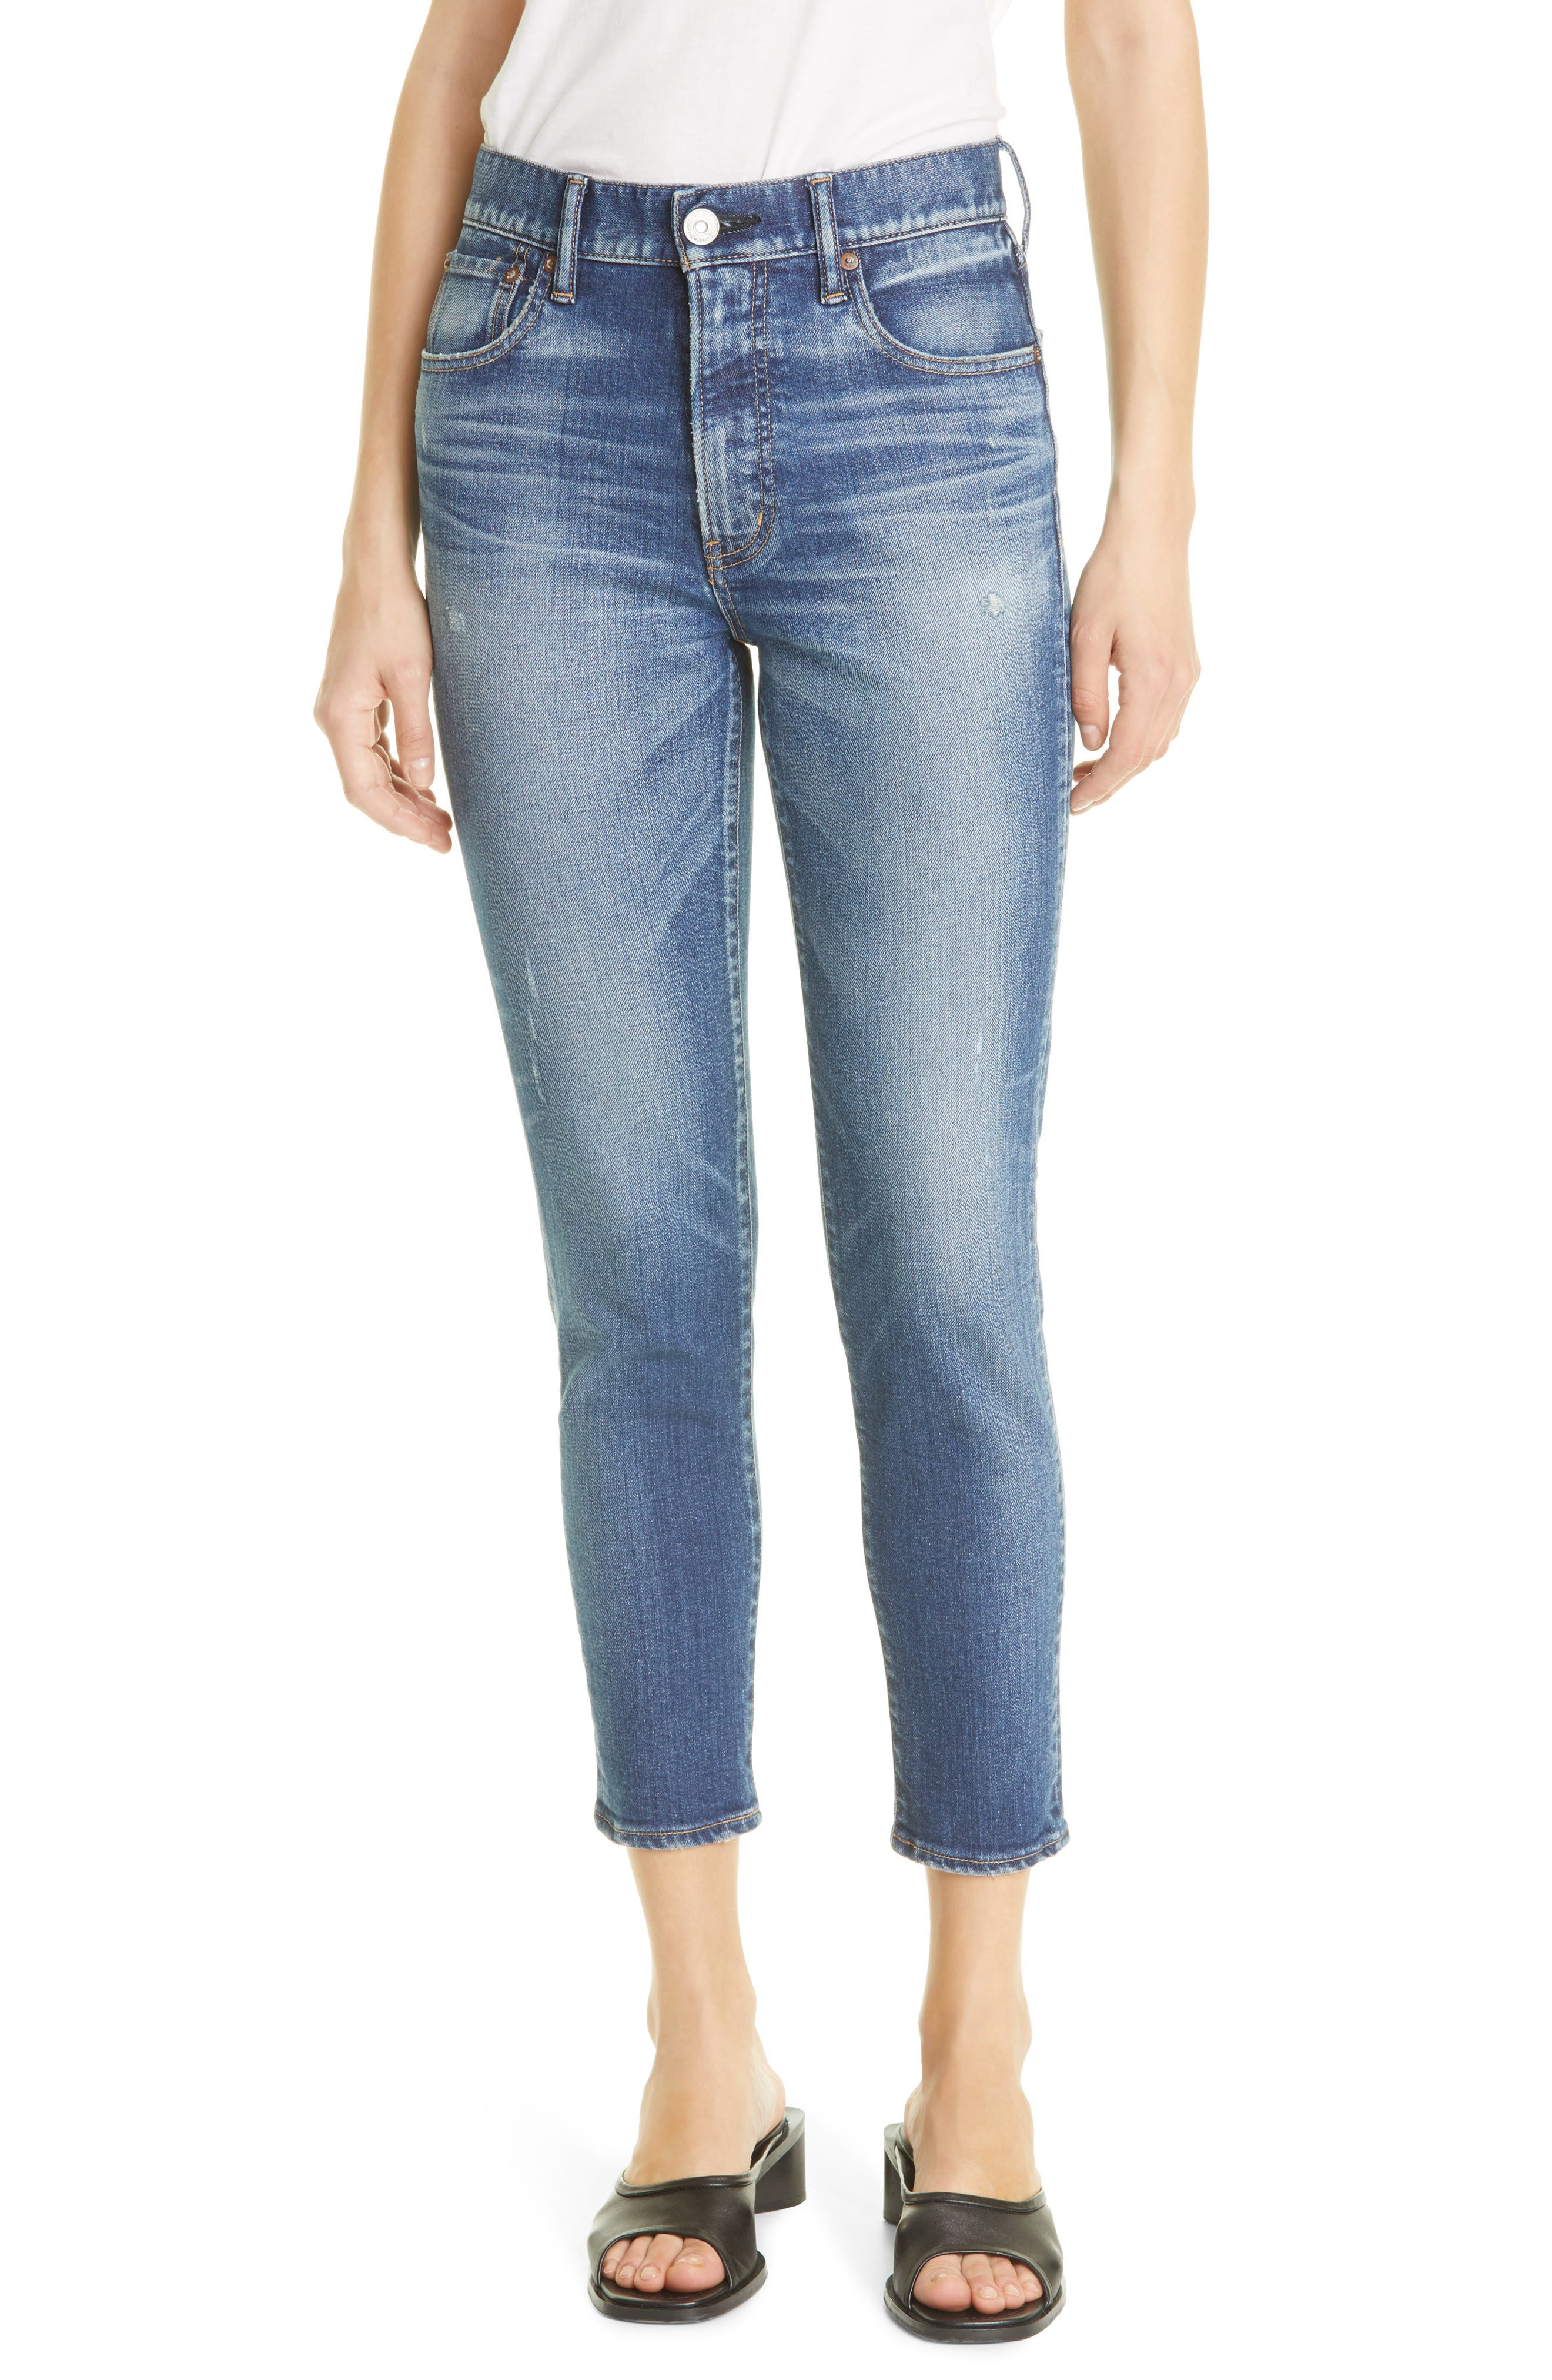 Tamworth High Waist Skinny Jeans